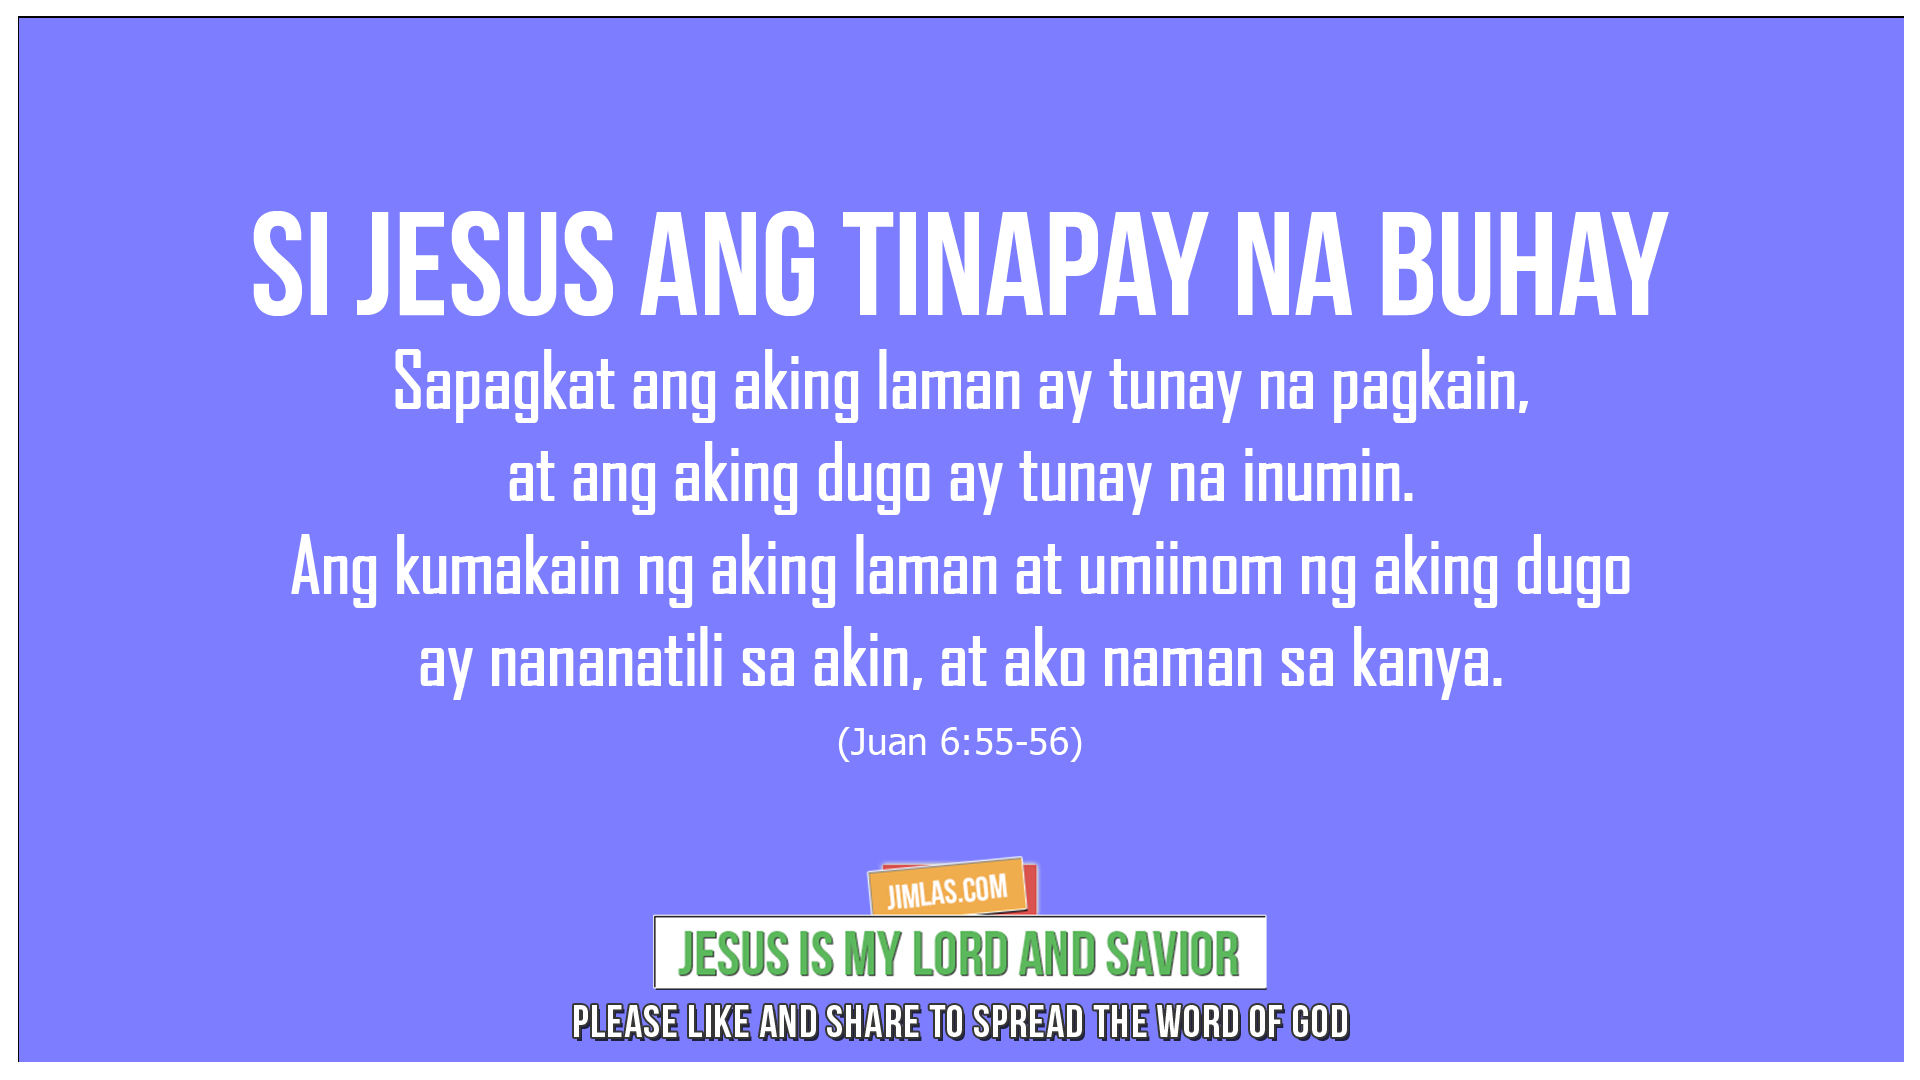 Juan 6 55-56, Juan 6:55-56